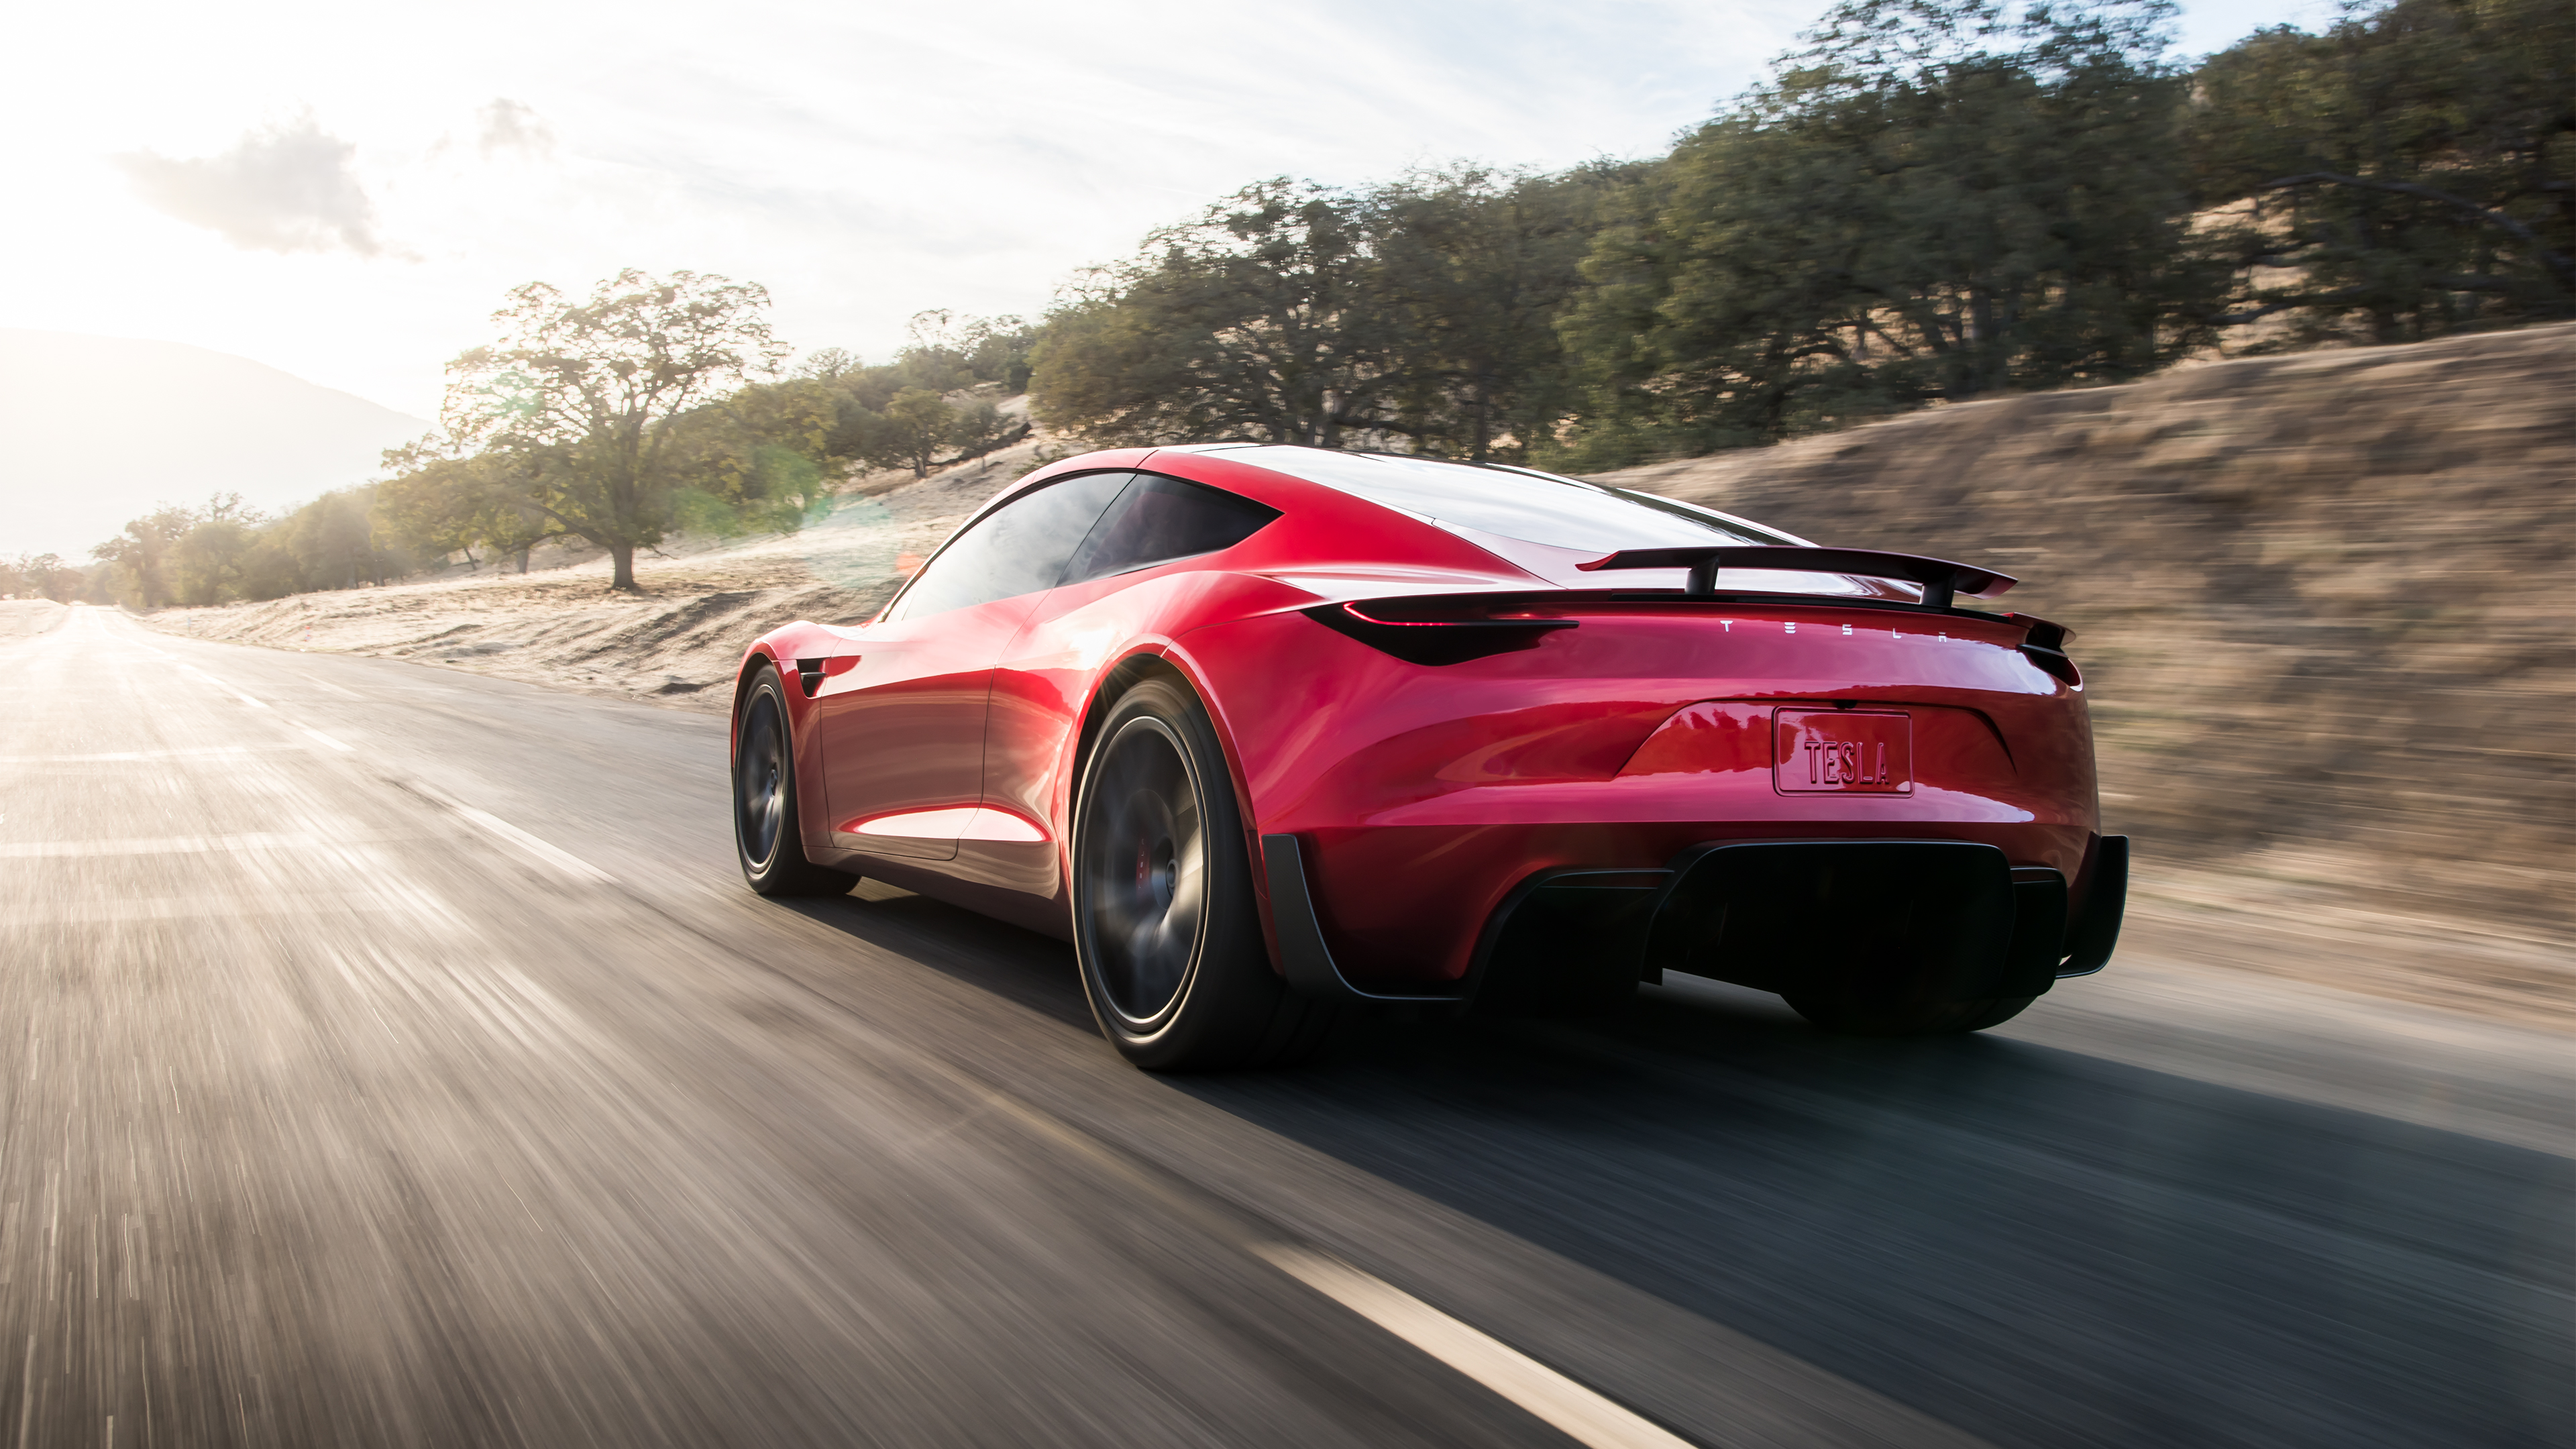 Tesla Roadster is 'embarrassing' us, says supercar maker Koenigsegg